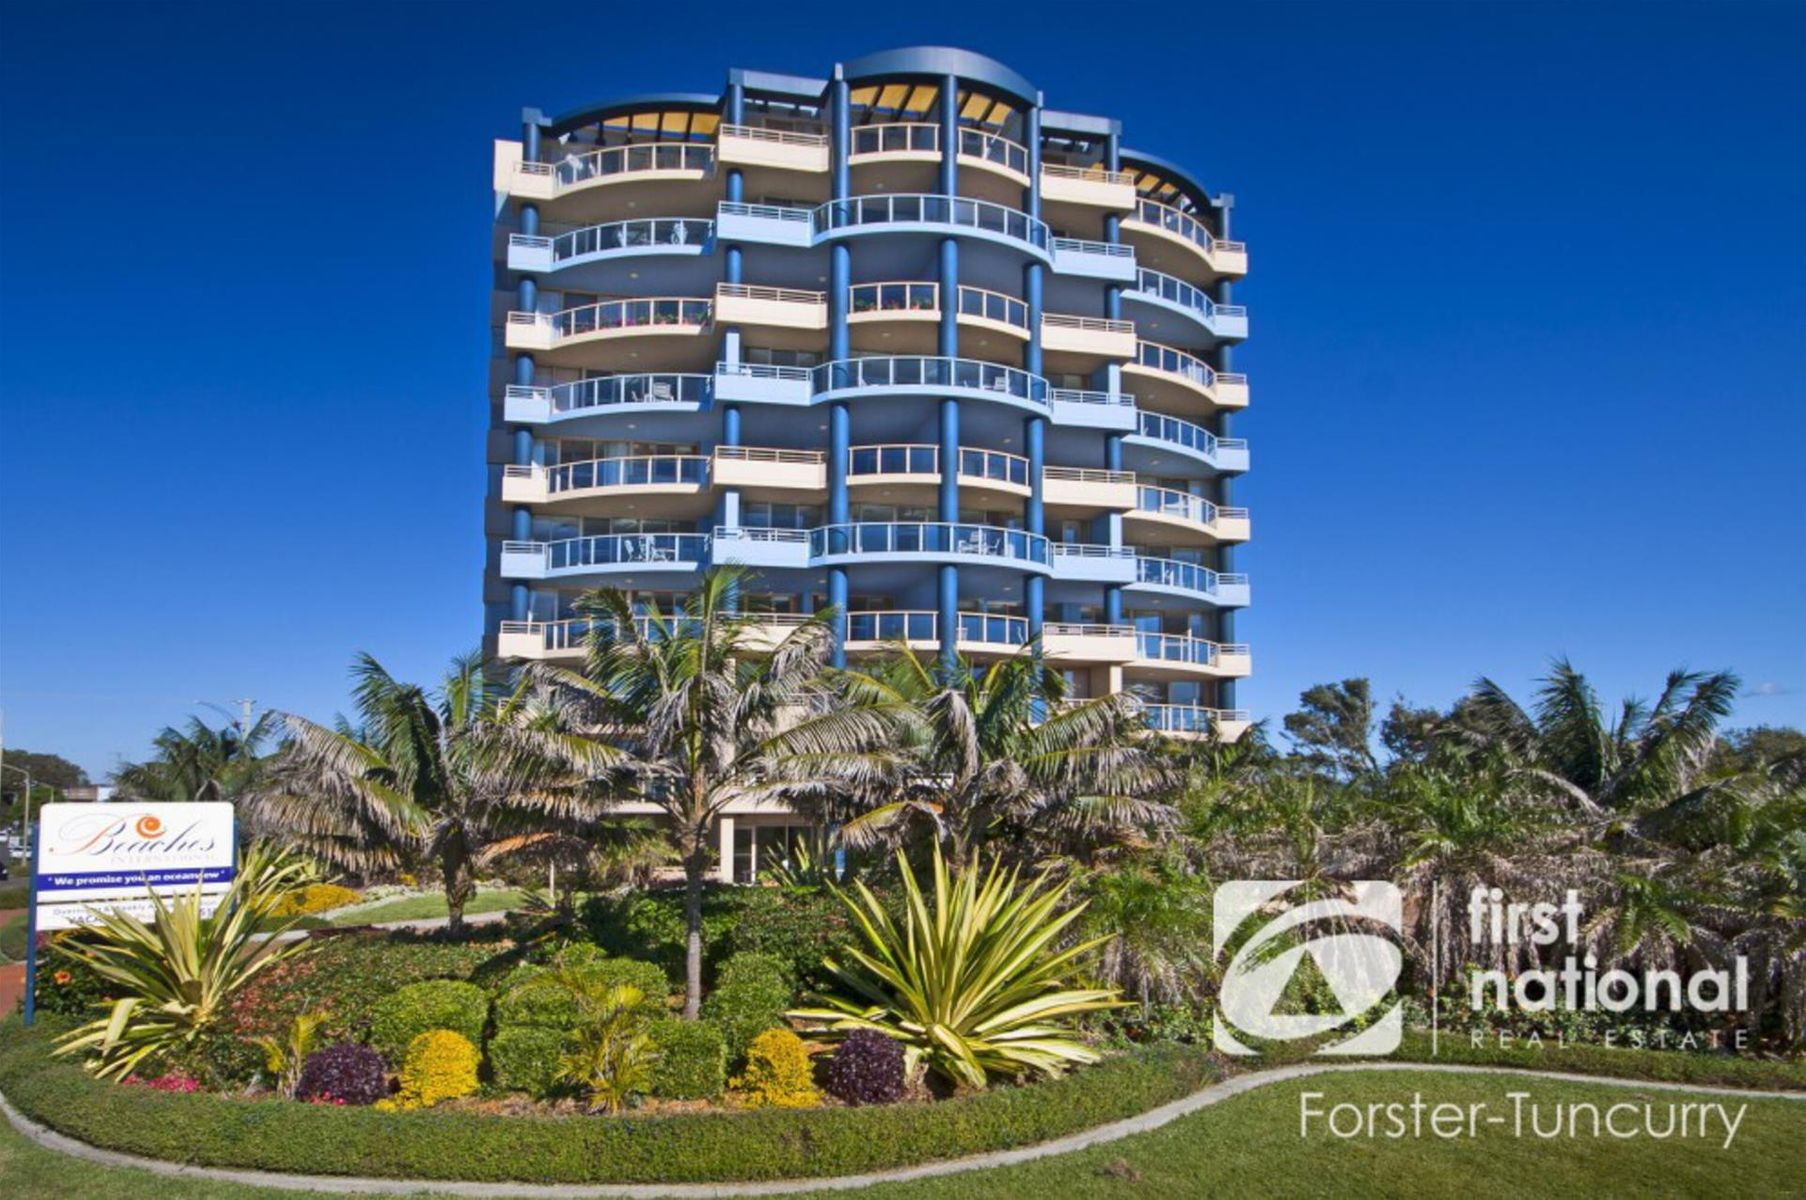 14/1-5 Beach Street, Forster, NSW 2428